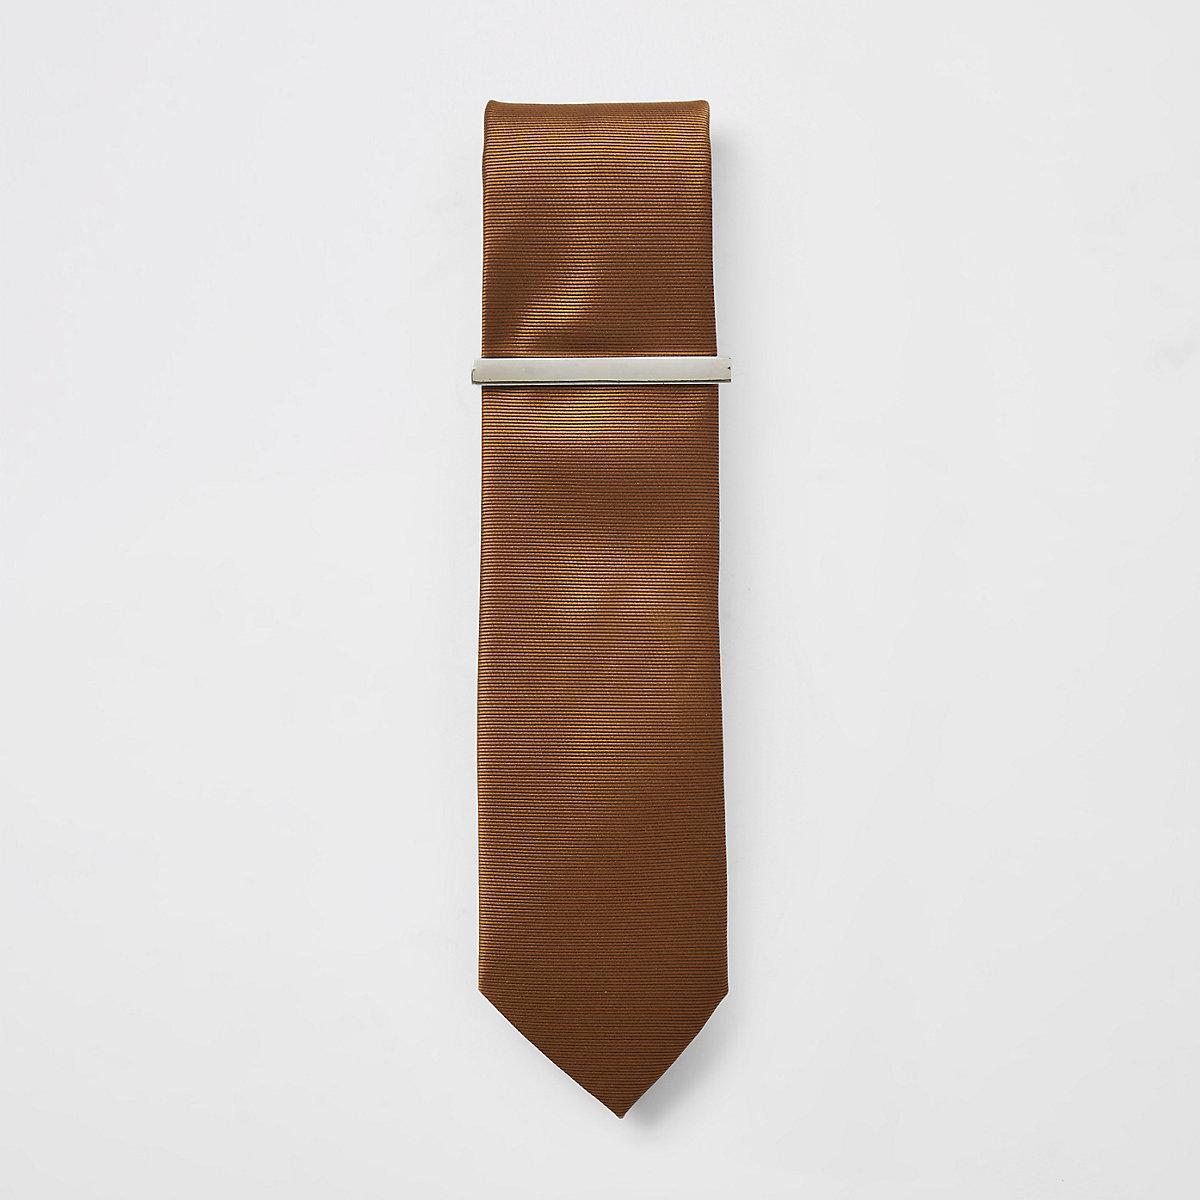 Brown textured tie and tie clip